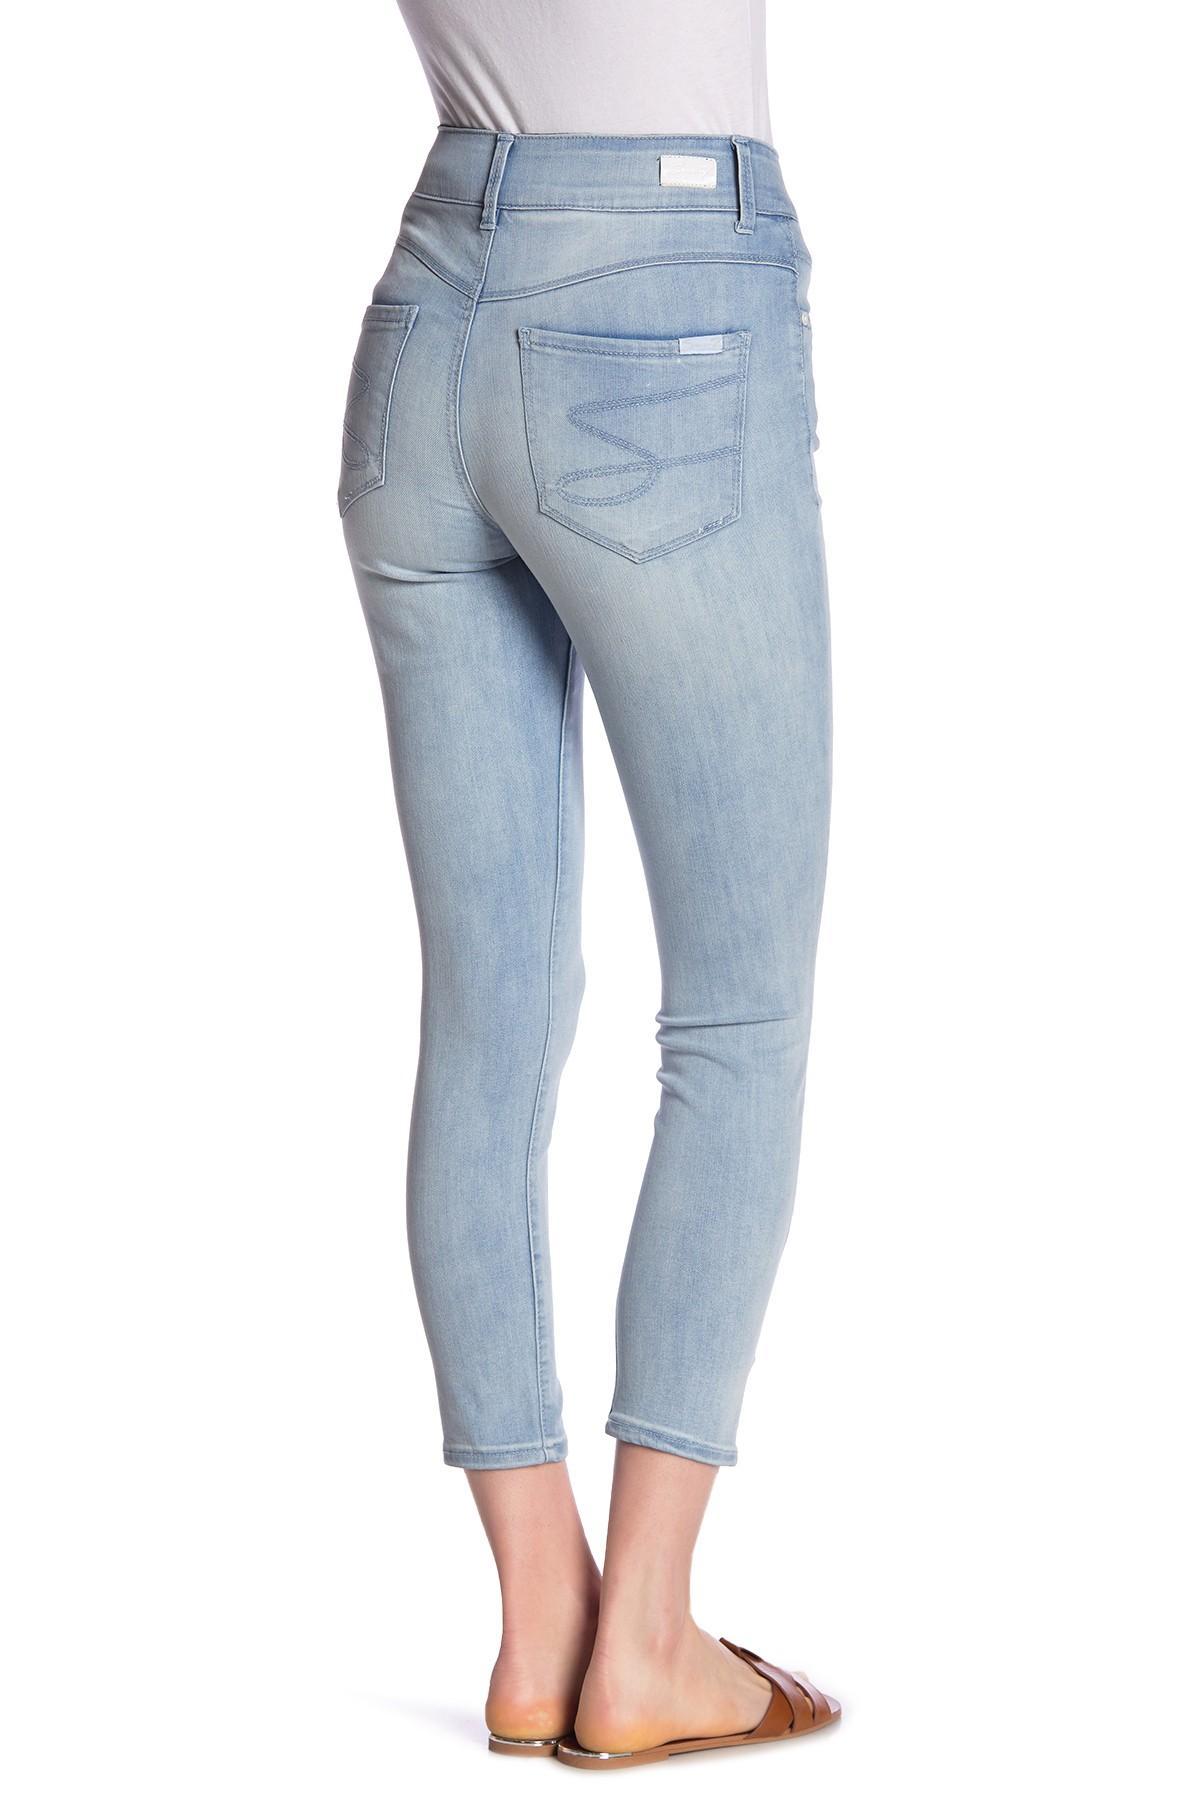 91a9f045 ... High Rise Shaper Ankle Skinny Jeans - Lyst. View fullscreen